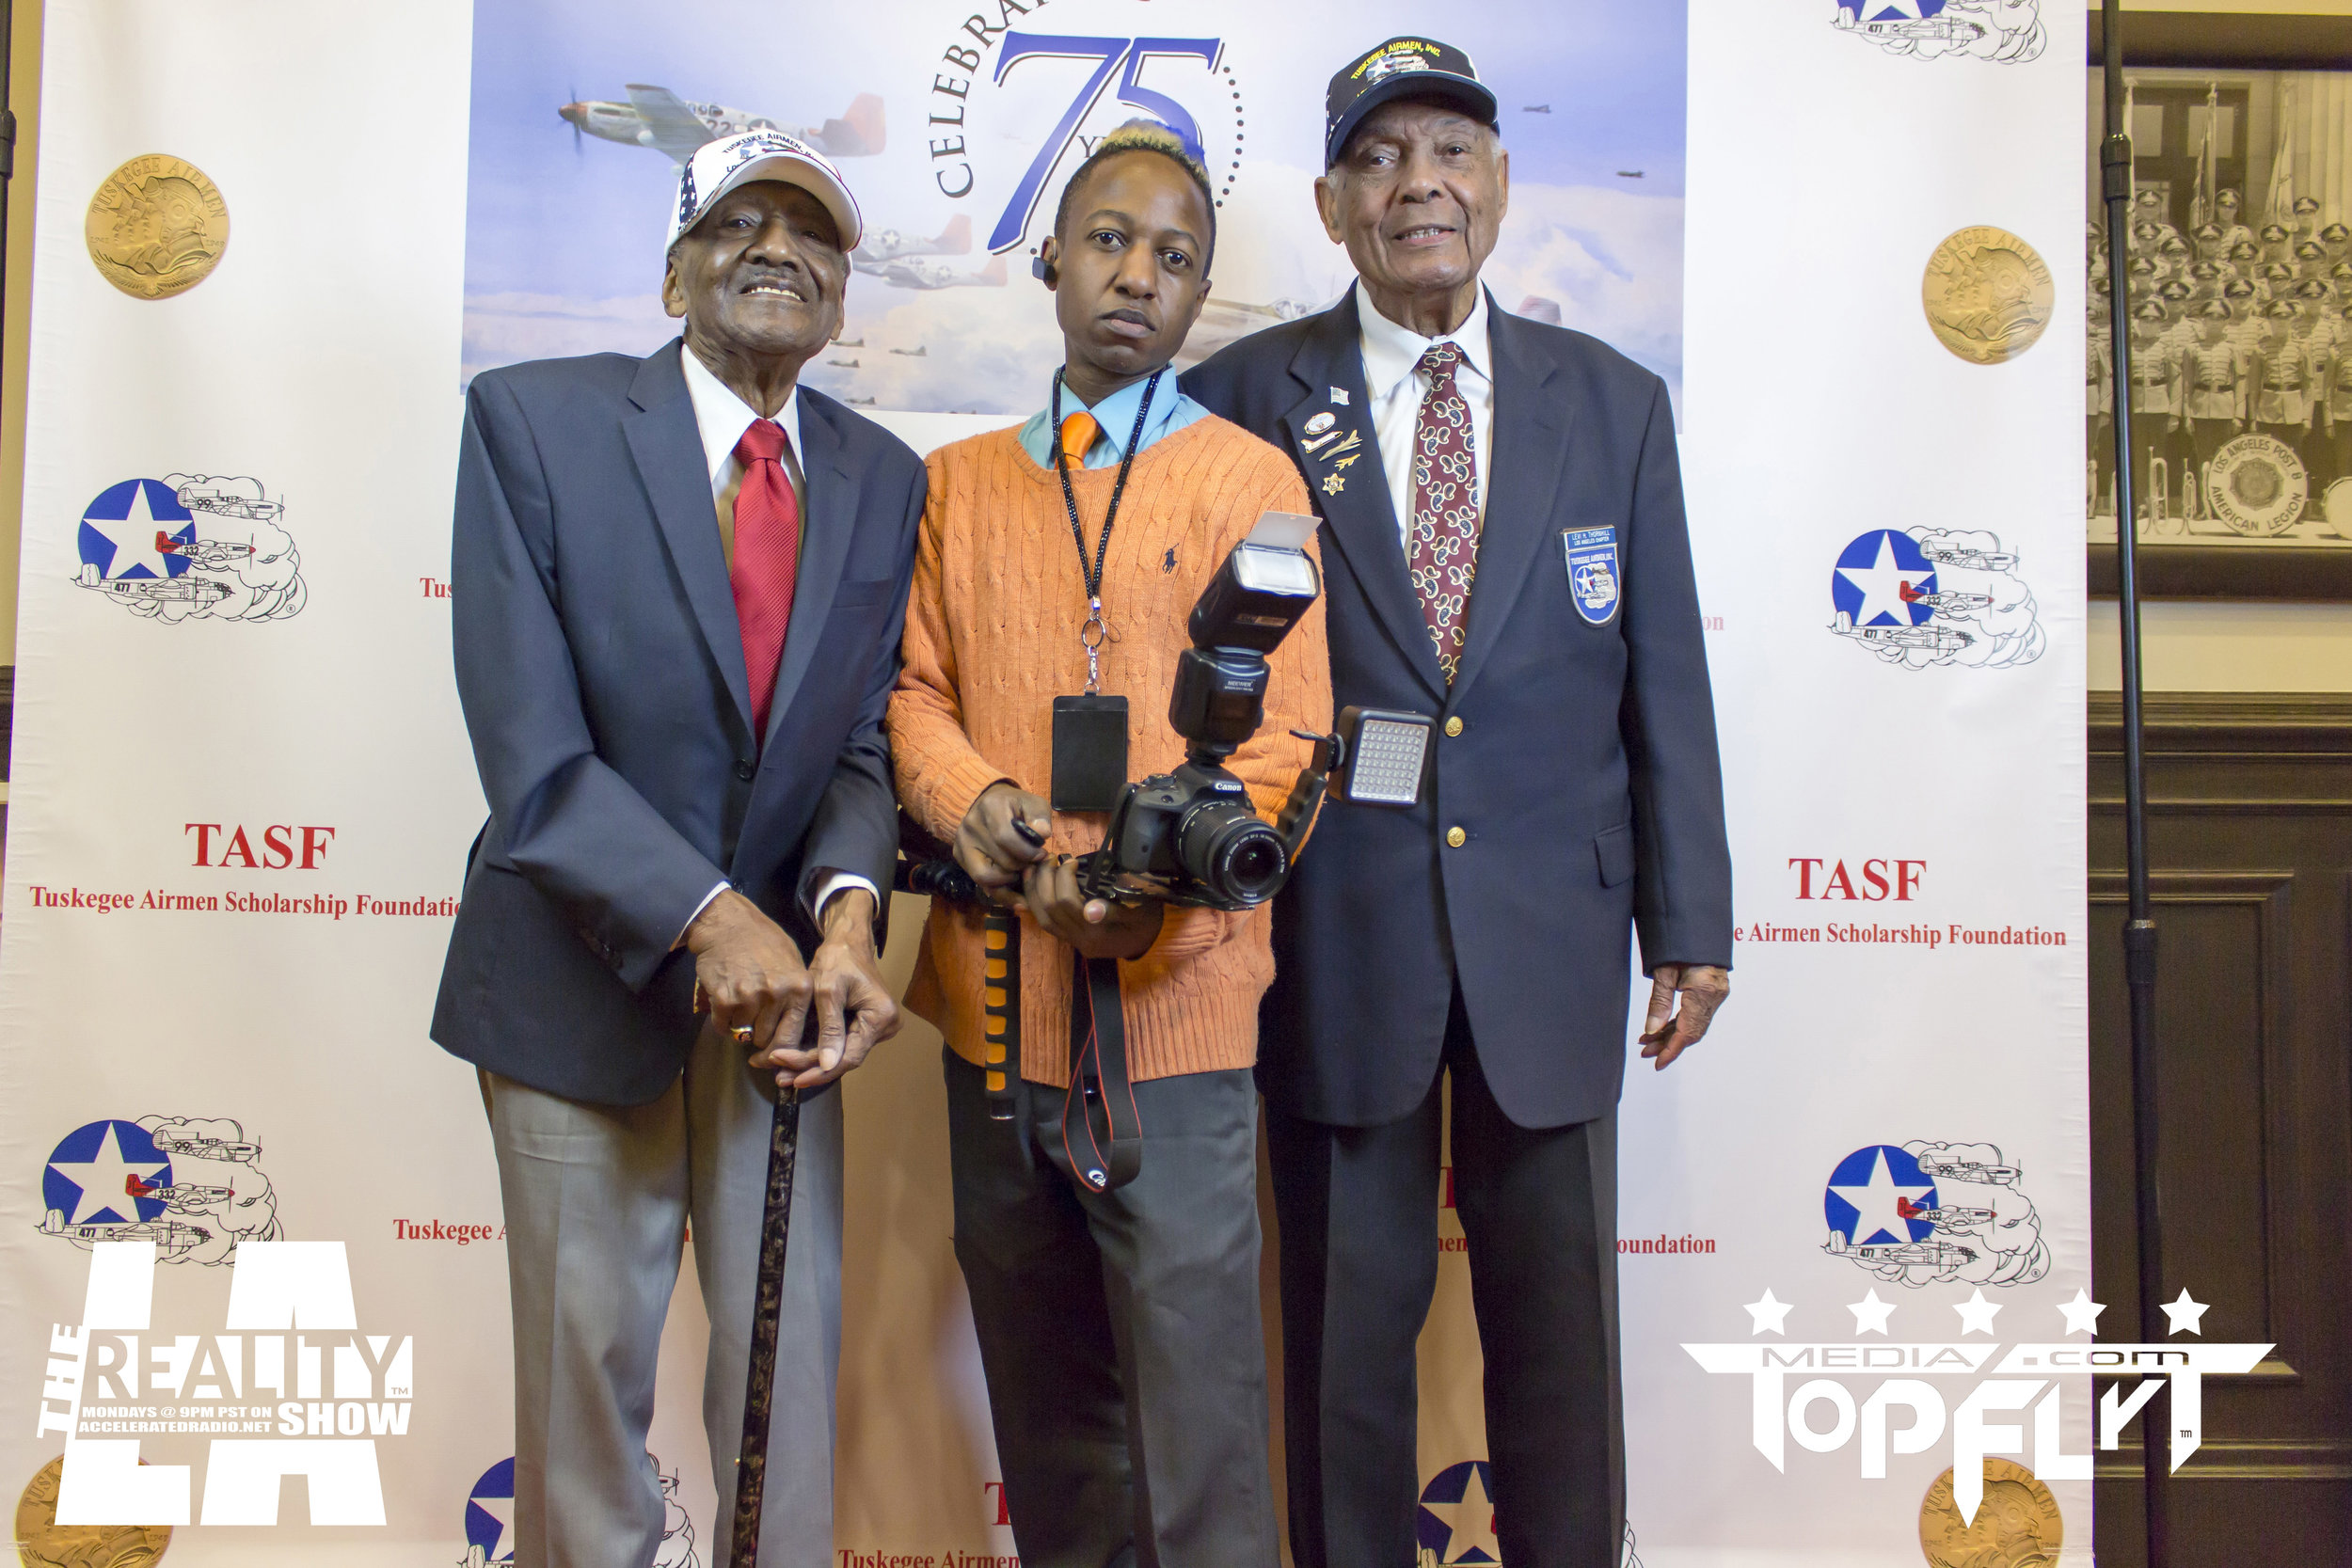 The Reality Show LA - Tuskegee Airmen 75th Anniversary VIP Reception_165.jpg